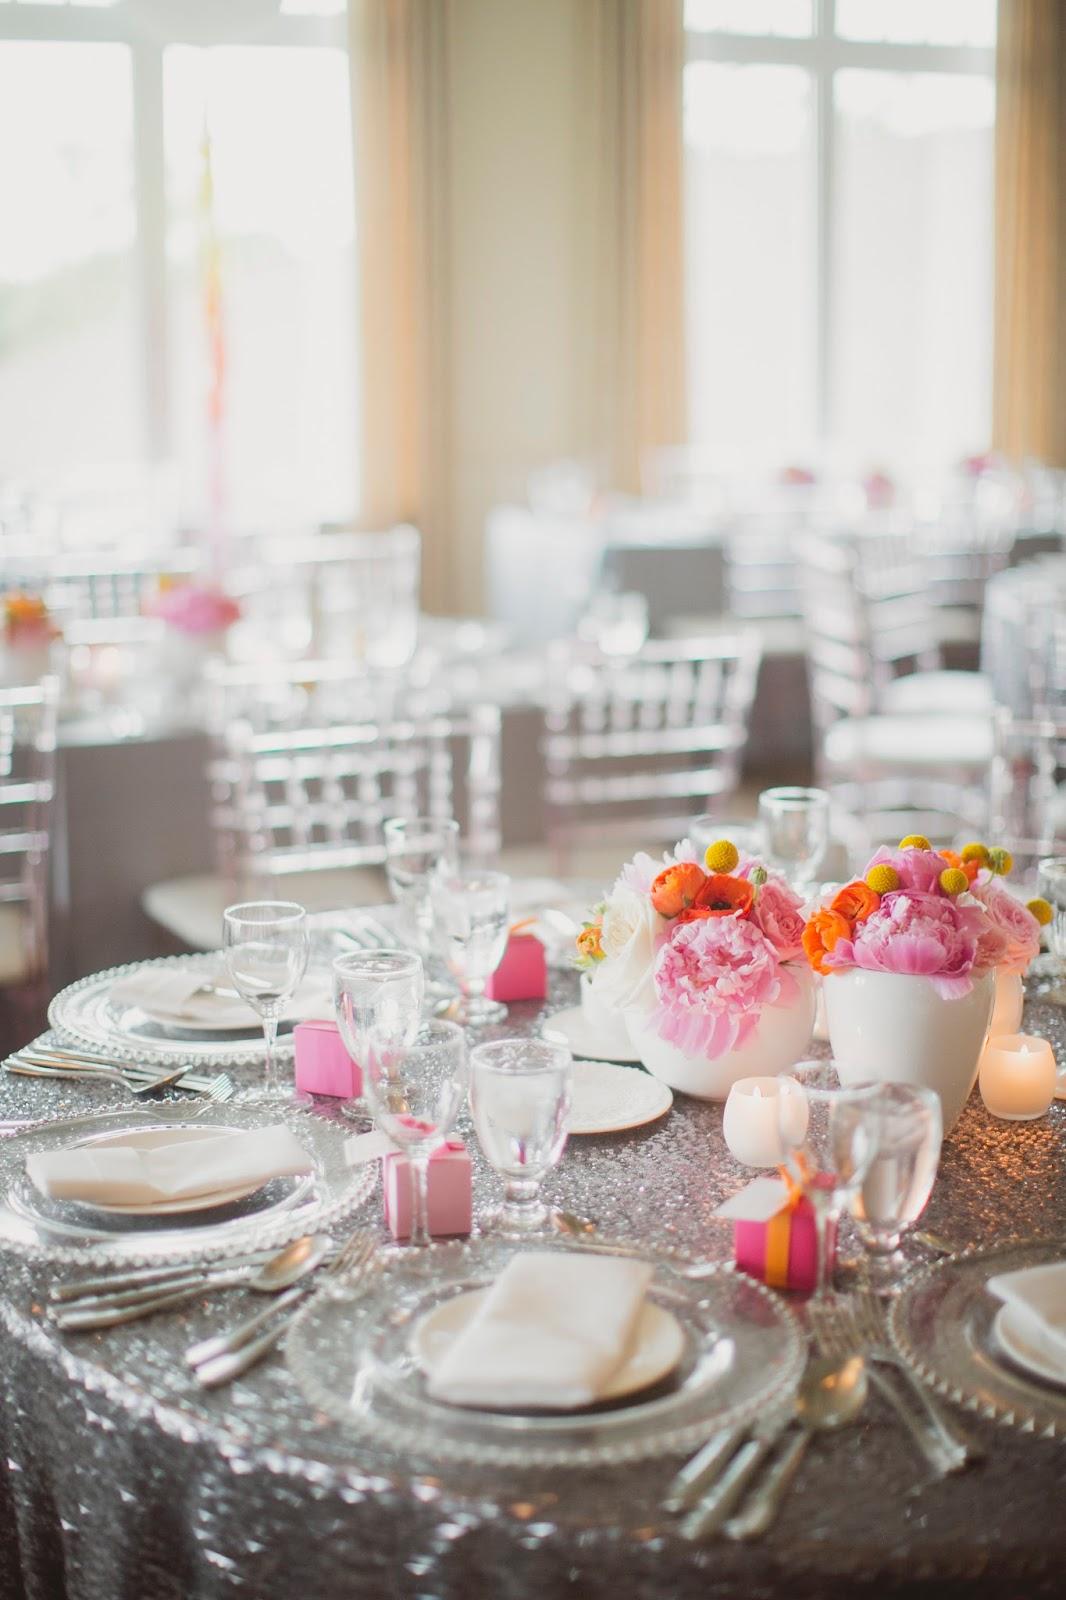 linen closet inc, sequin linens toronto hamilton burlington kj and co burlington golf and country club wedding photos oakville wedding planner, wedding table, kj and co wedding, decor and more